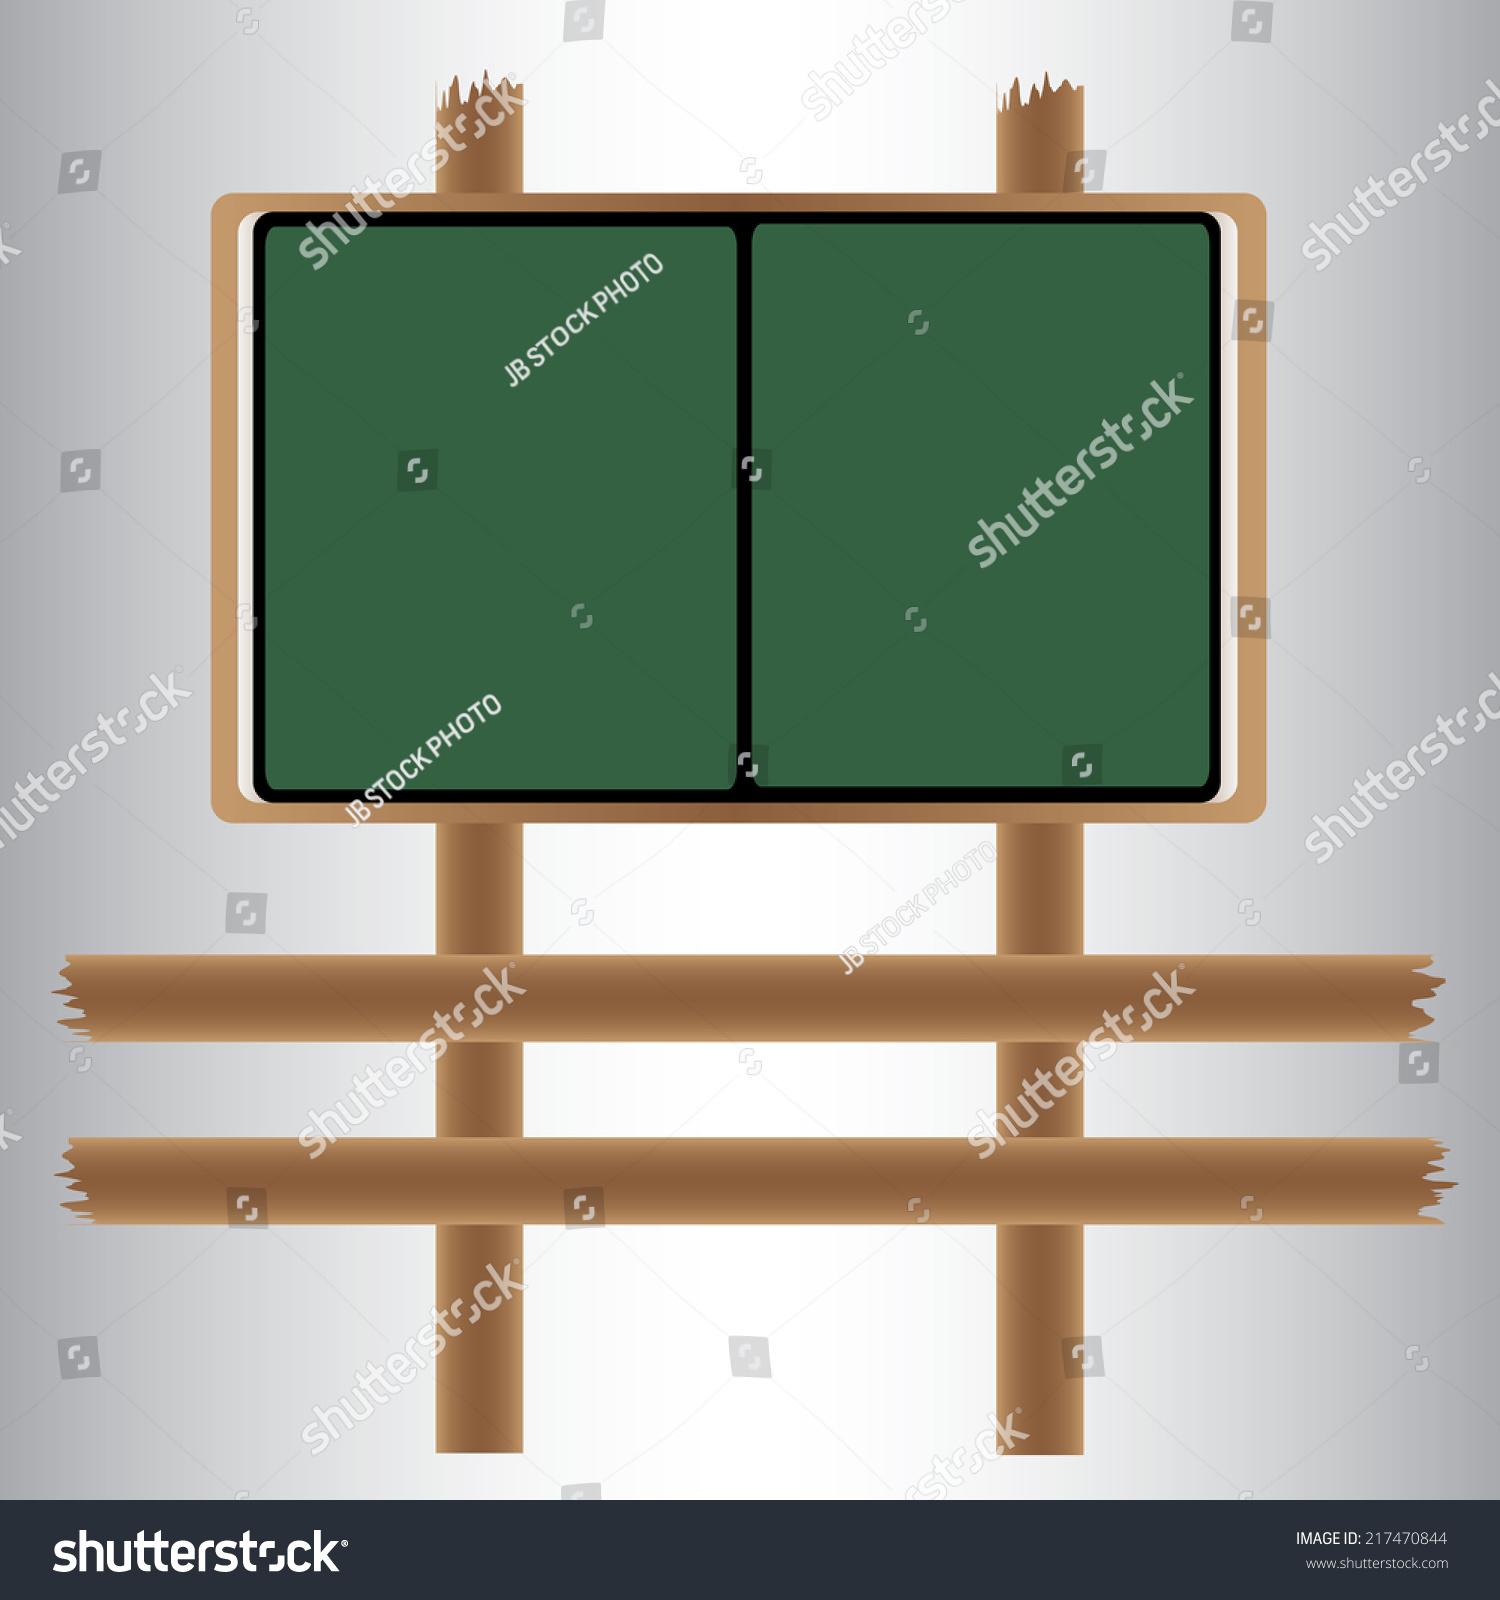 wooden sidewalk sign with blank green menu board